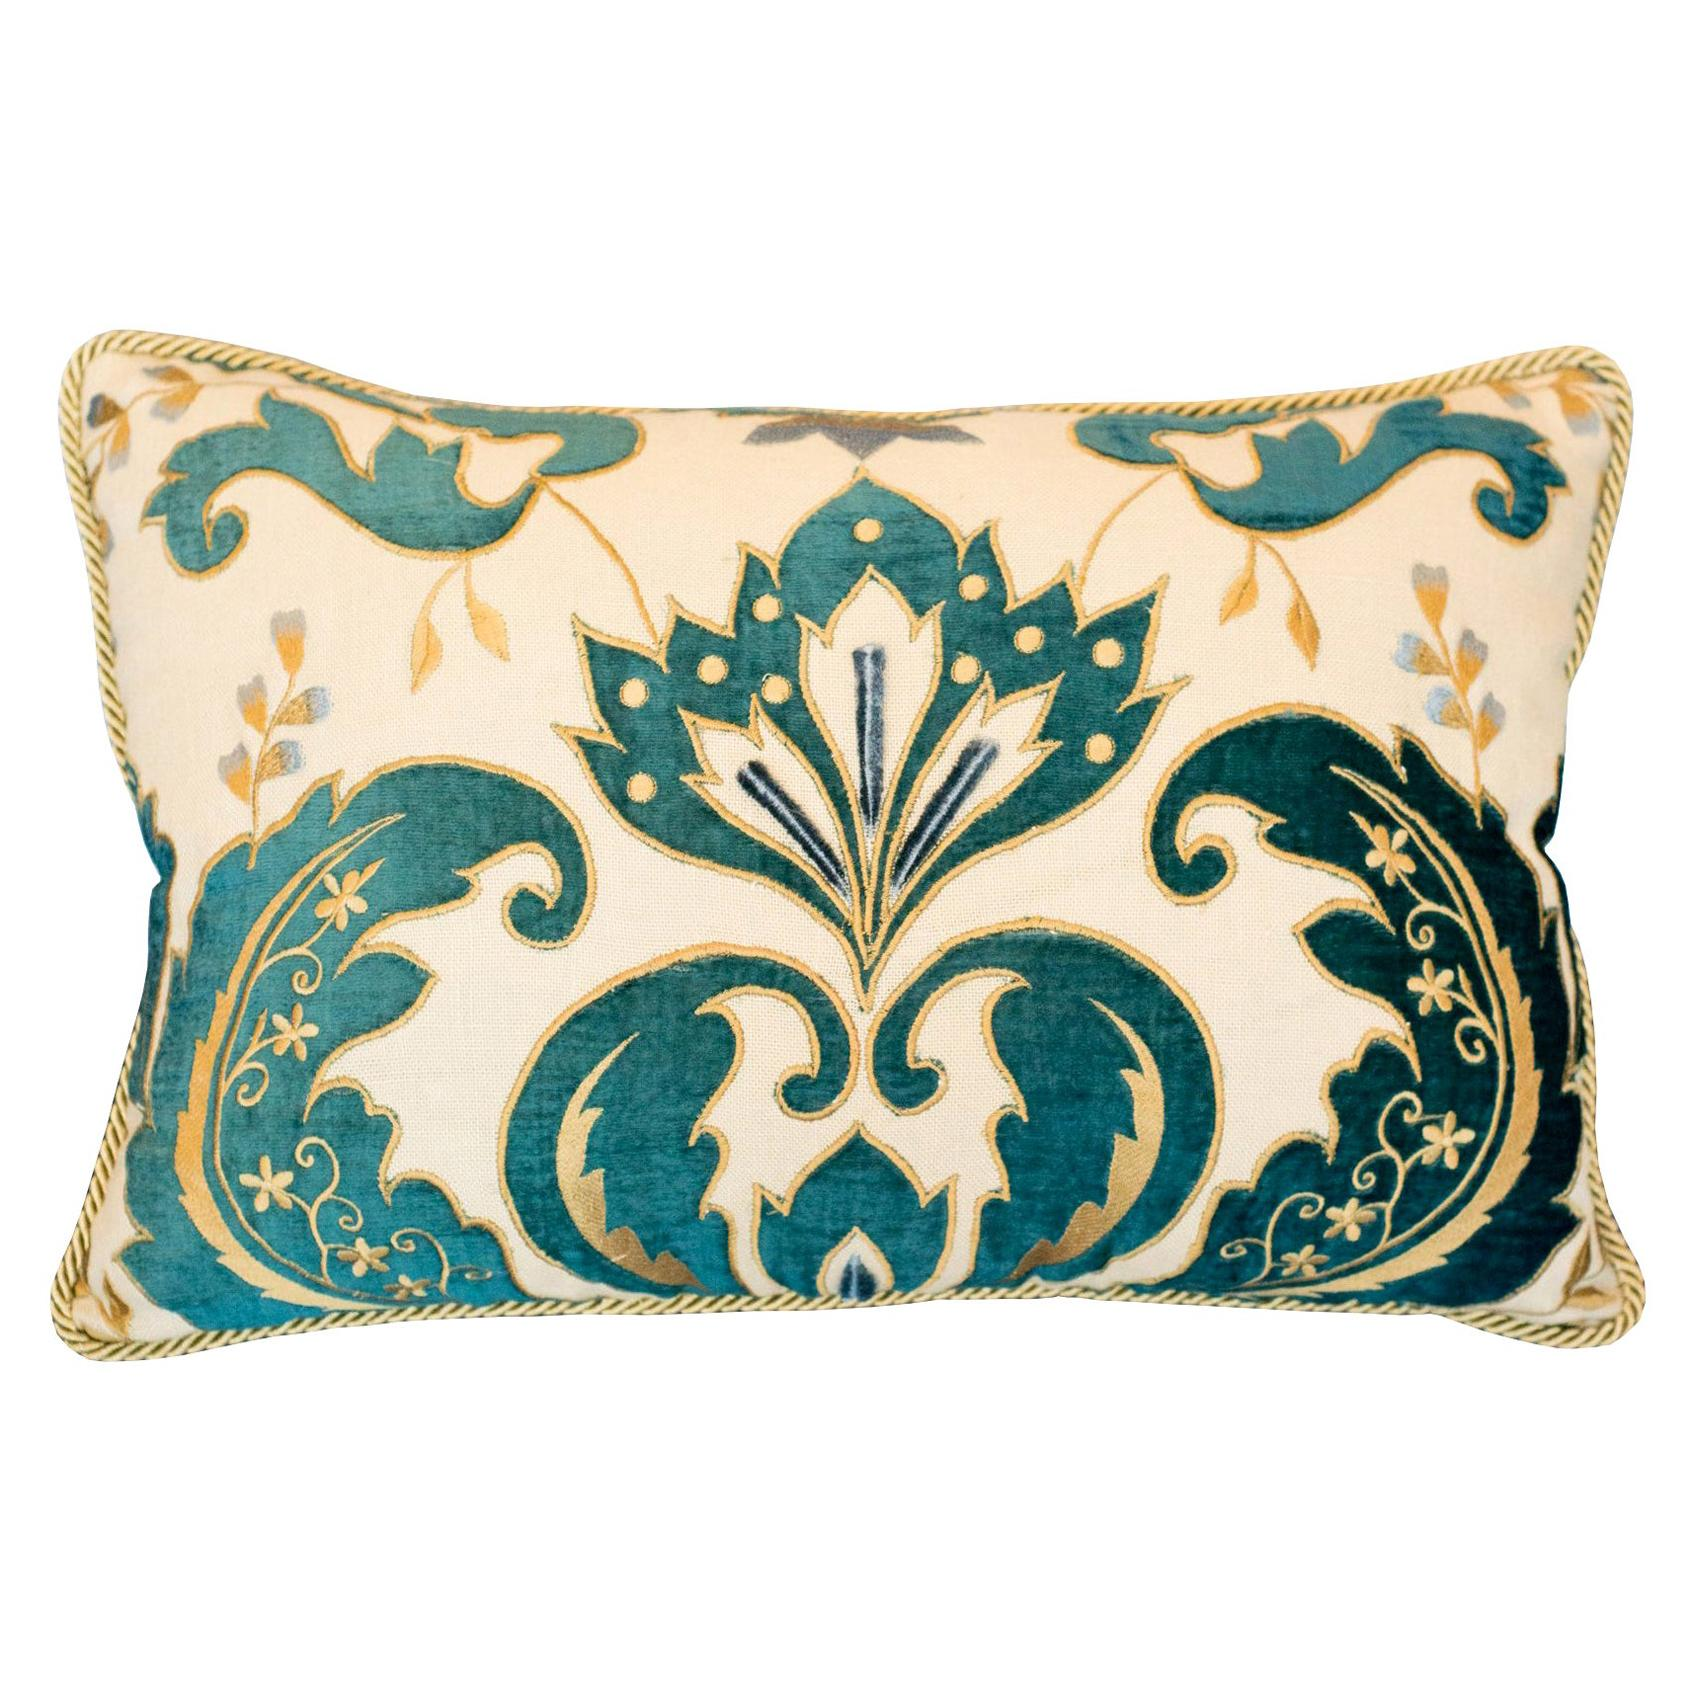 Linen and Blue Cut Velvet Pillow with Metallic Rope Trim by Studio Maison Nurita